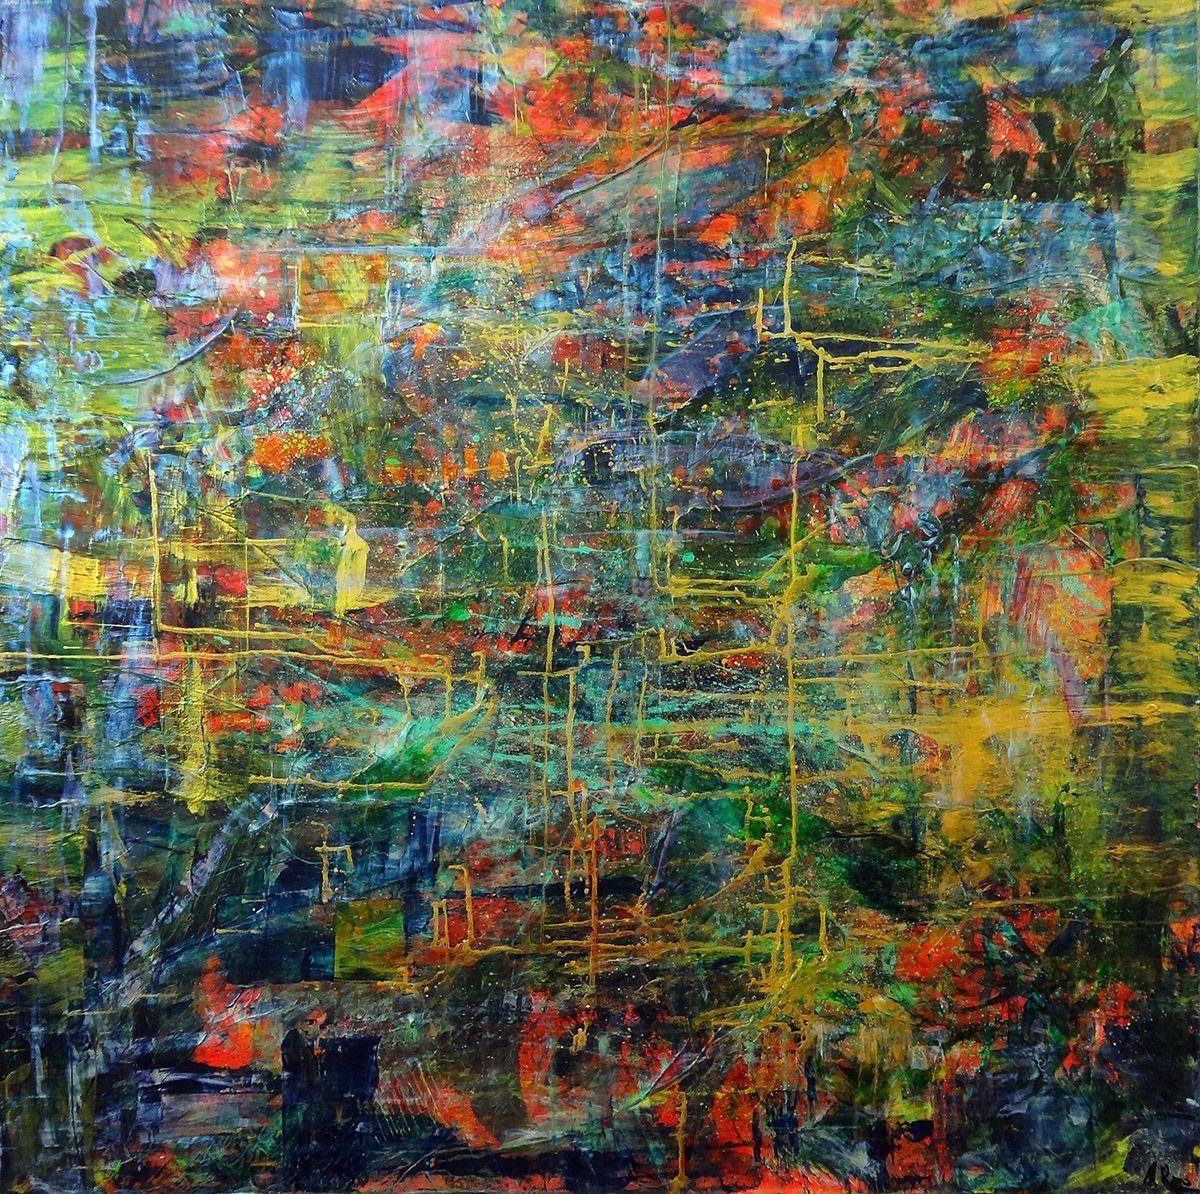 Abstract Art Painting by Nestor Toro dansisken